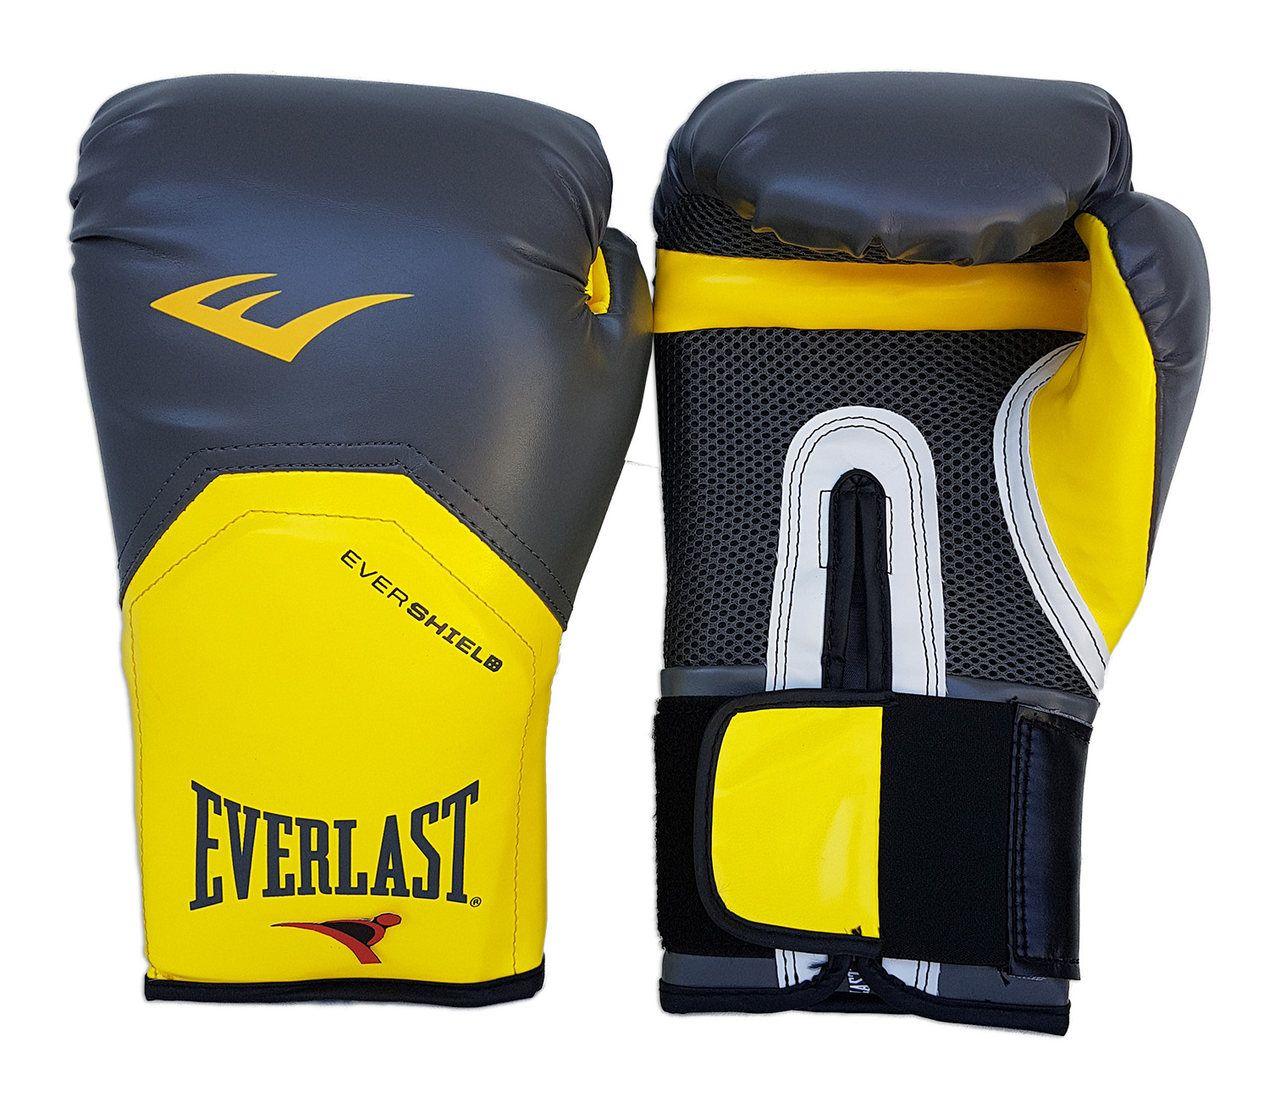 Luva de Boxe / Muay Thai 14oz - Cinza com Amarelo - Pro Style - Everlast  - PRALUTA SHOP